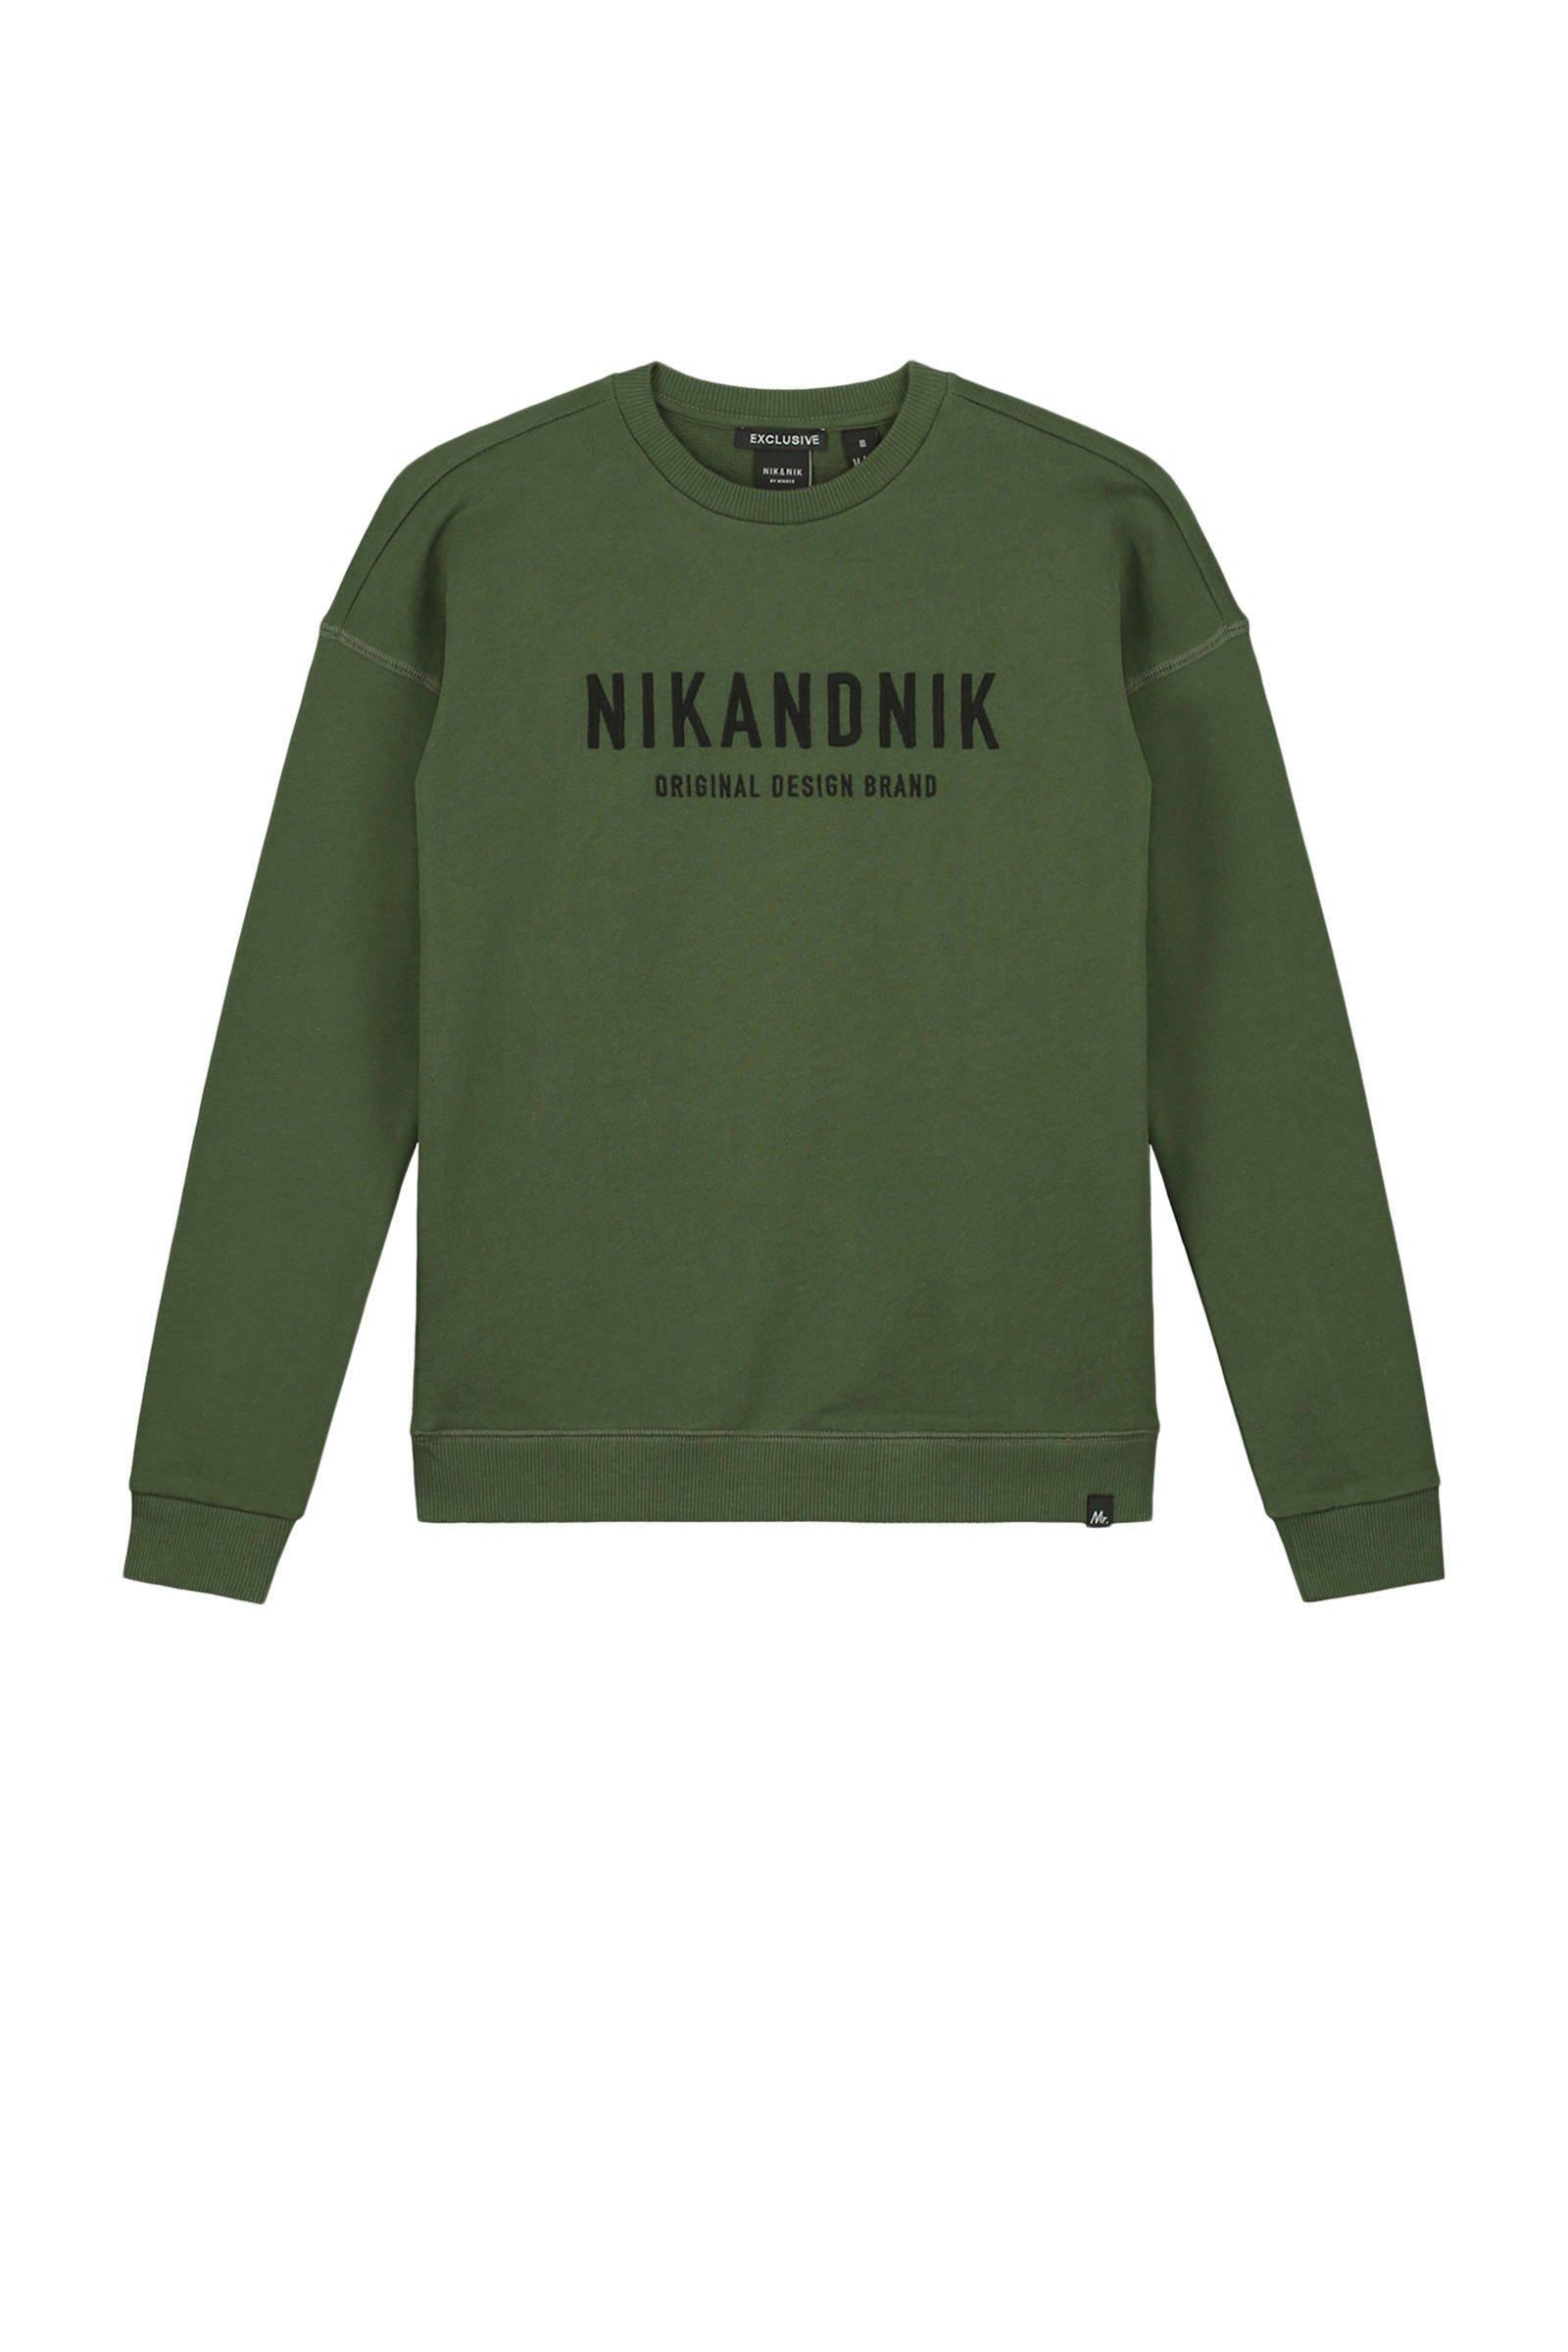 NIK&NIK sweater Milo met logo mosgroen - maat 164